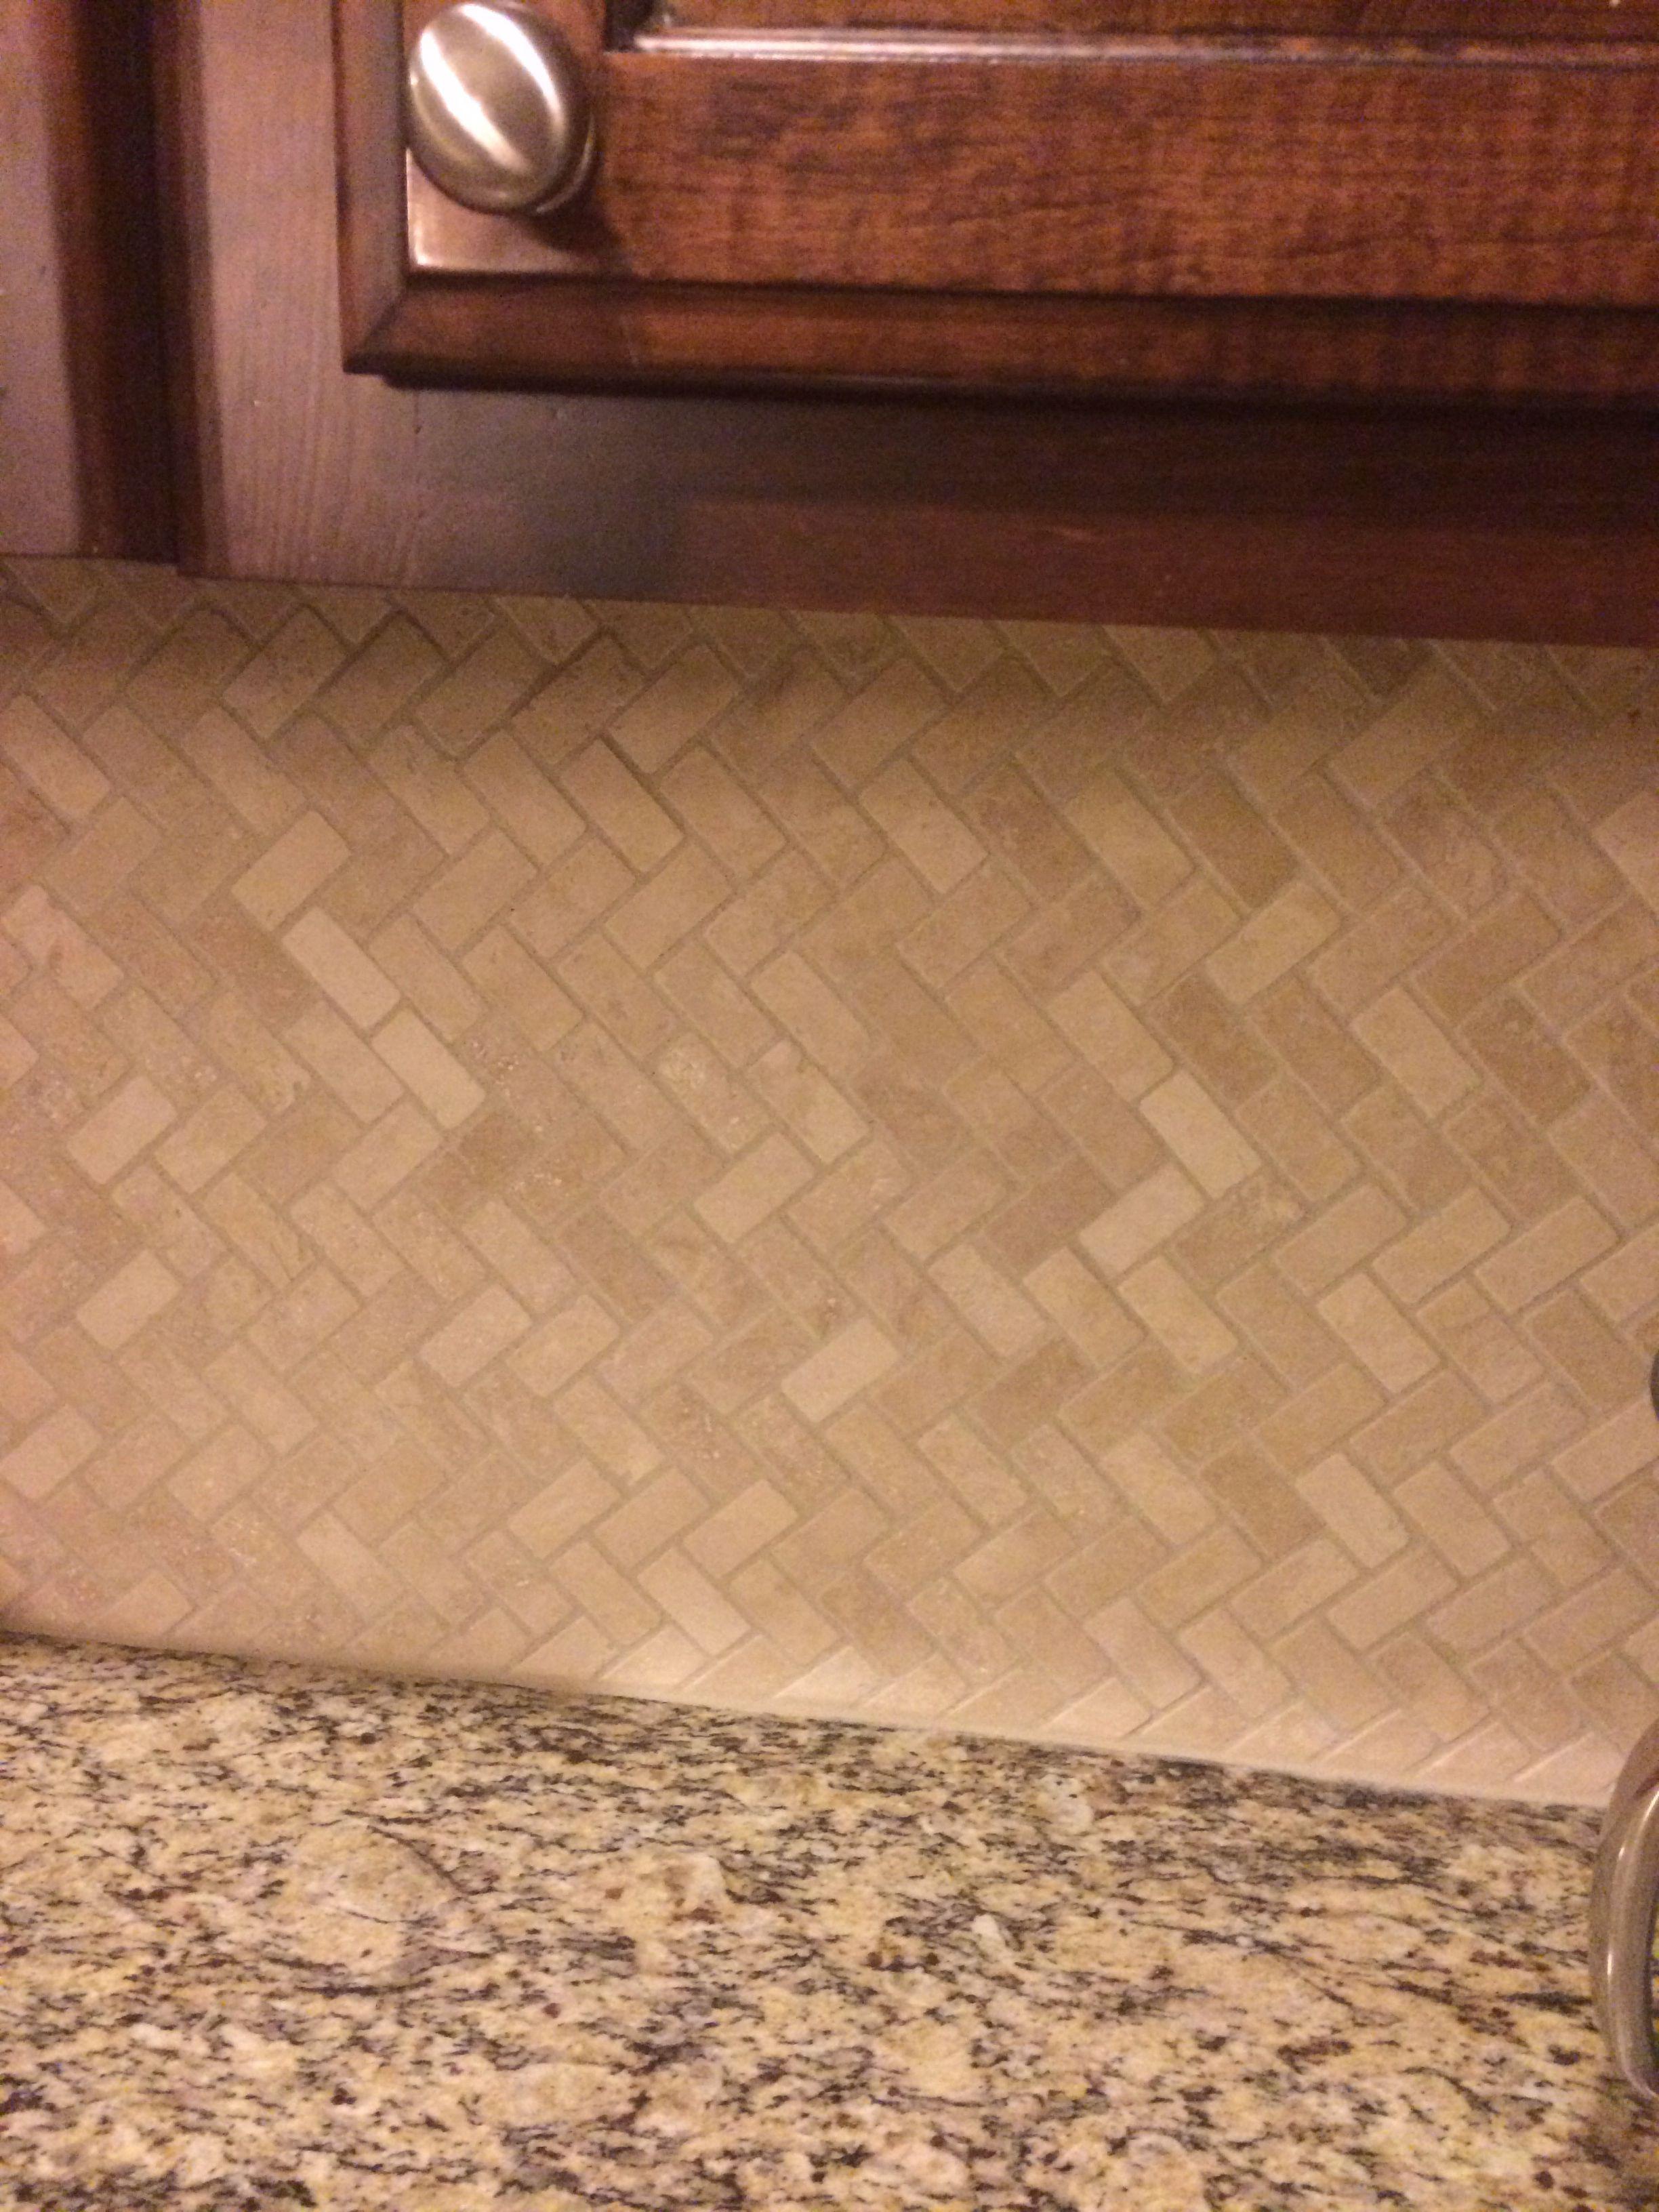 Mixed Quartz Herringbone Stone Mosaic Tile Beadboard Backsplash Herringbone Backsplash Travertine Backsplash